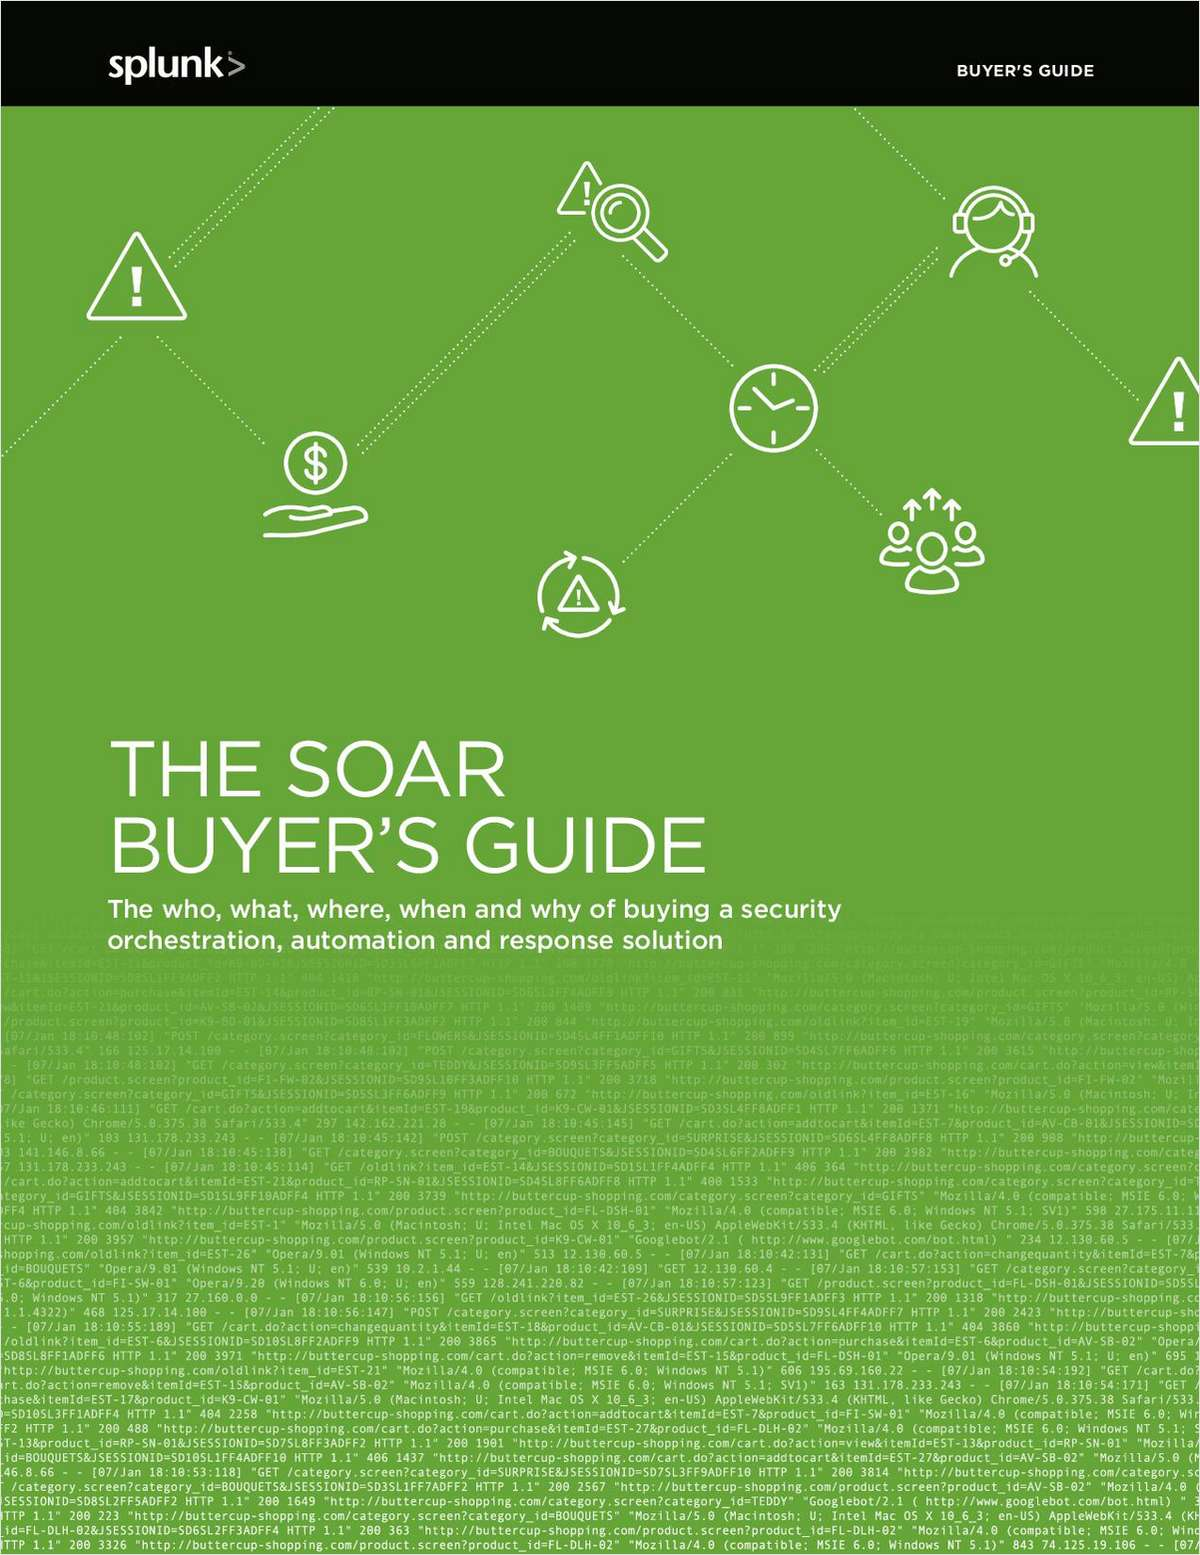 The SOAR Buyer's Guide